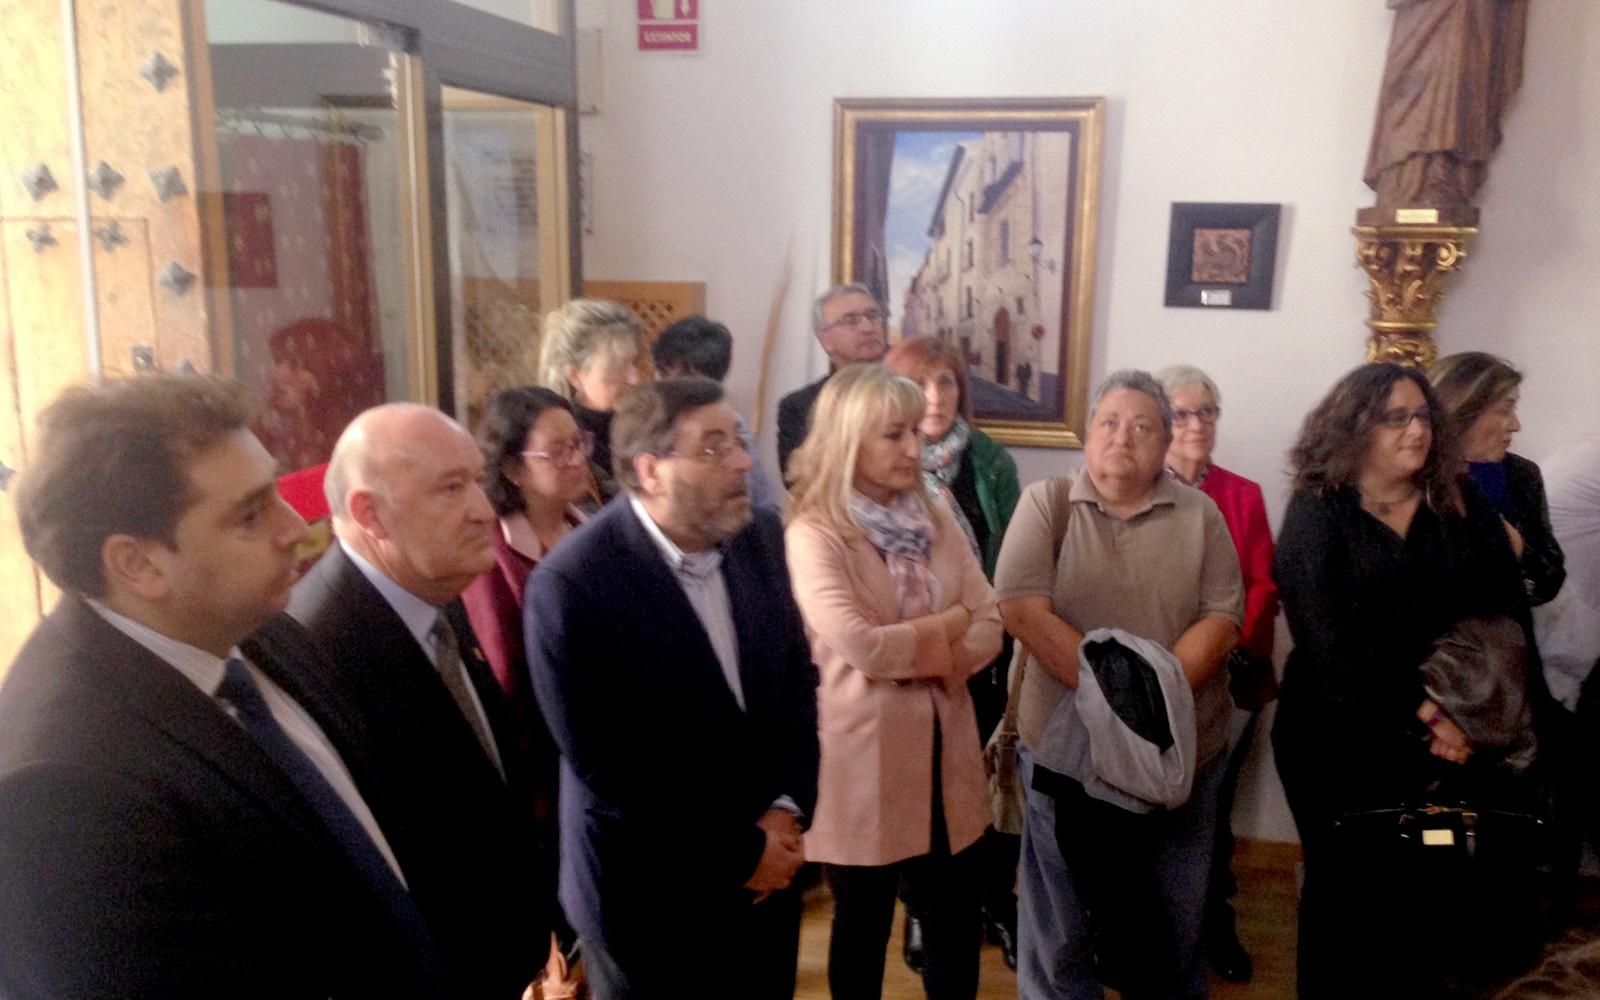 https://blog.globalcaja.es/wp-content/uploads/2017/10/Globalcaja-centro-de-mayores-San-Pedro.jpg